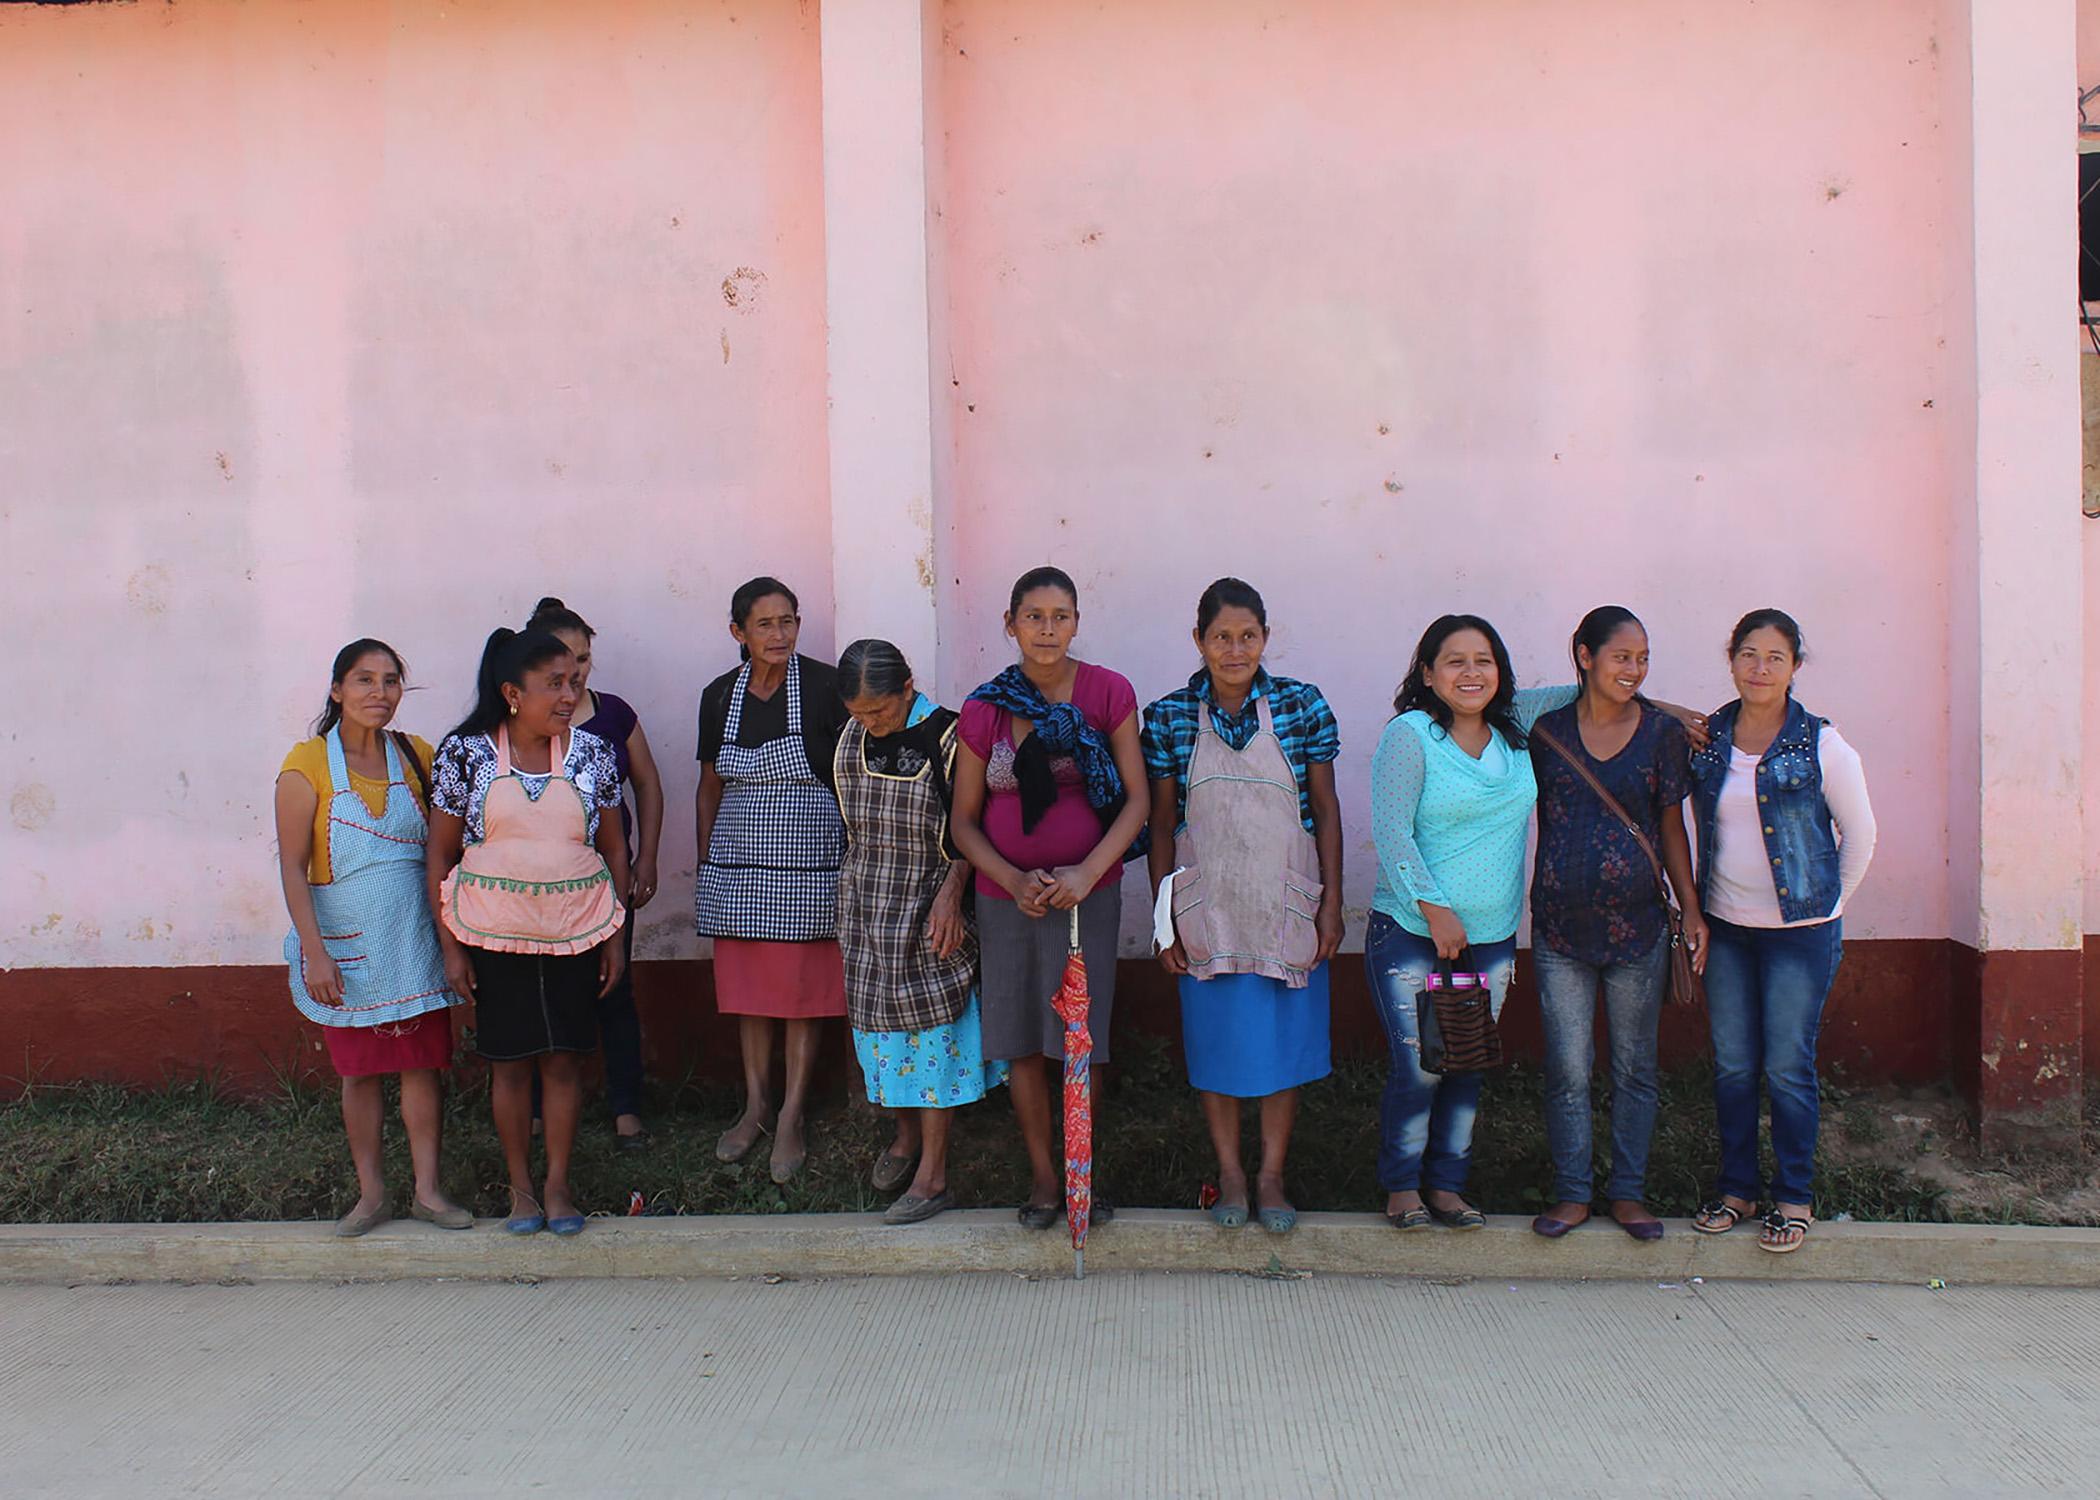 https://redstrandcoffee.com/wp-content/uploads/2019/11/Red-de-Mujeres.jpg